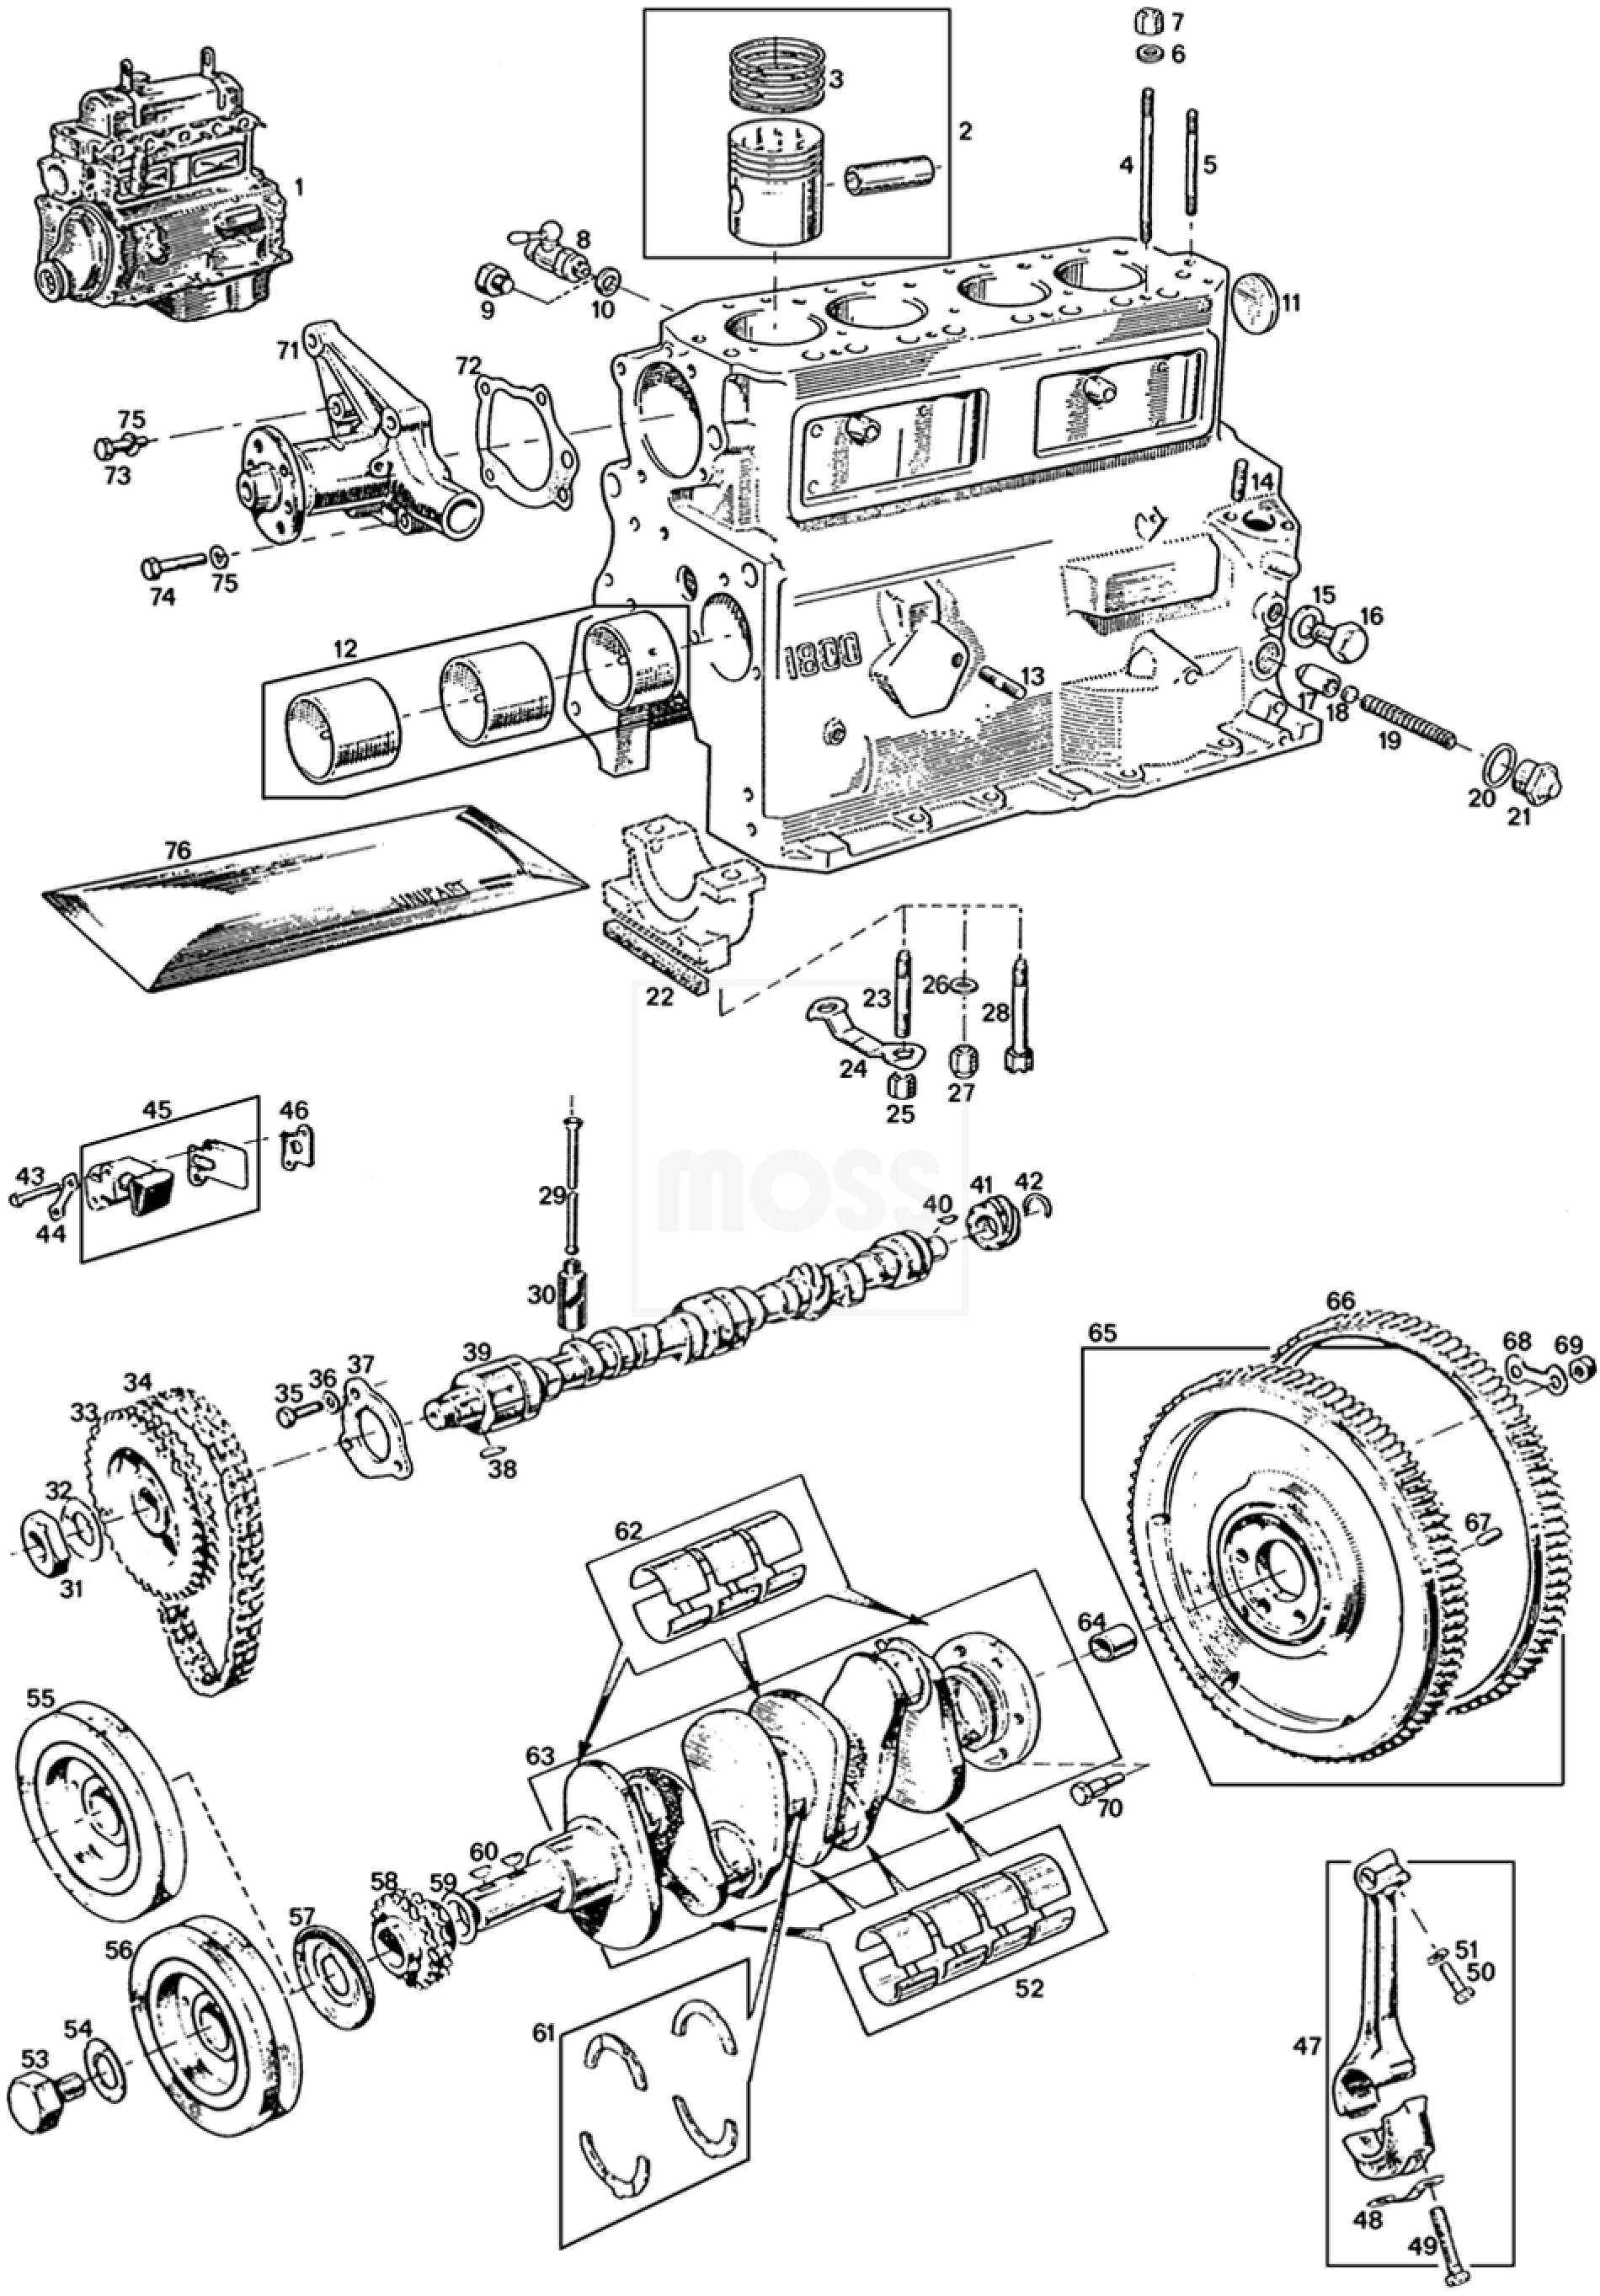 small resolution of mgb c v8 engine engines components external internal engine 3 main bearing 18g ga mgb